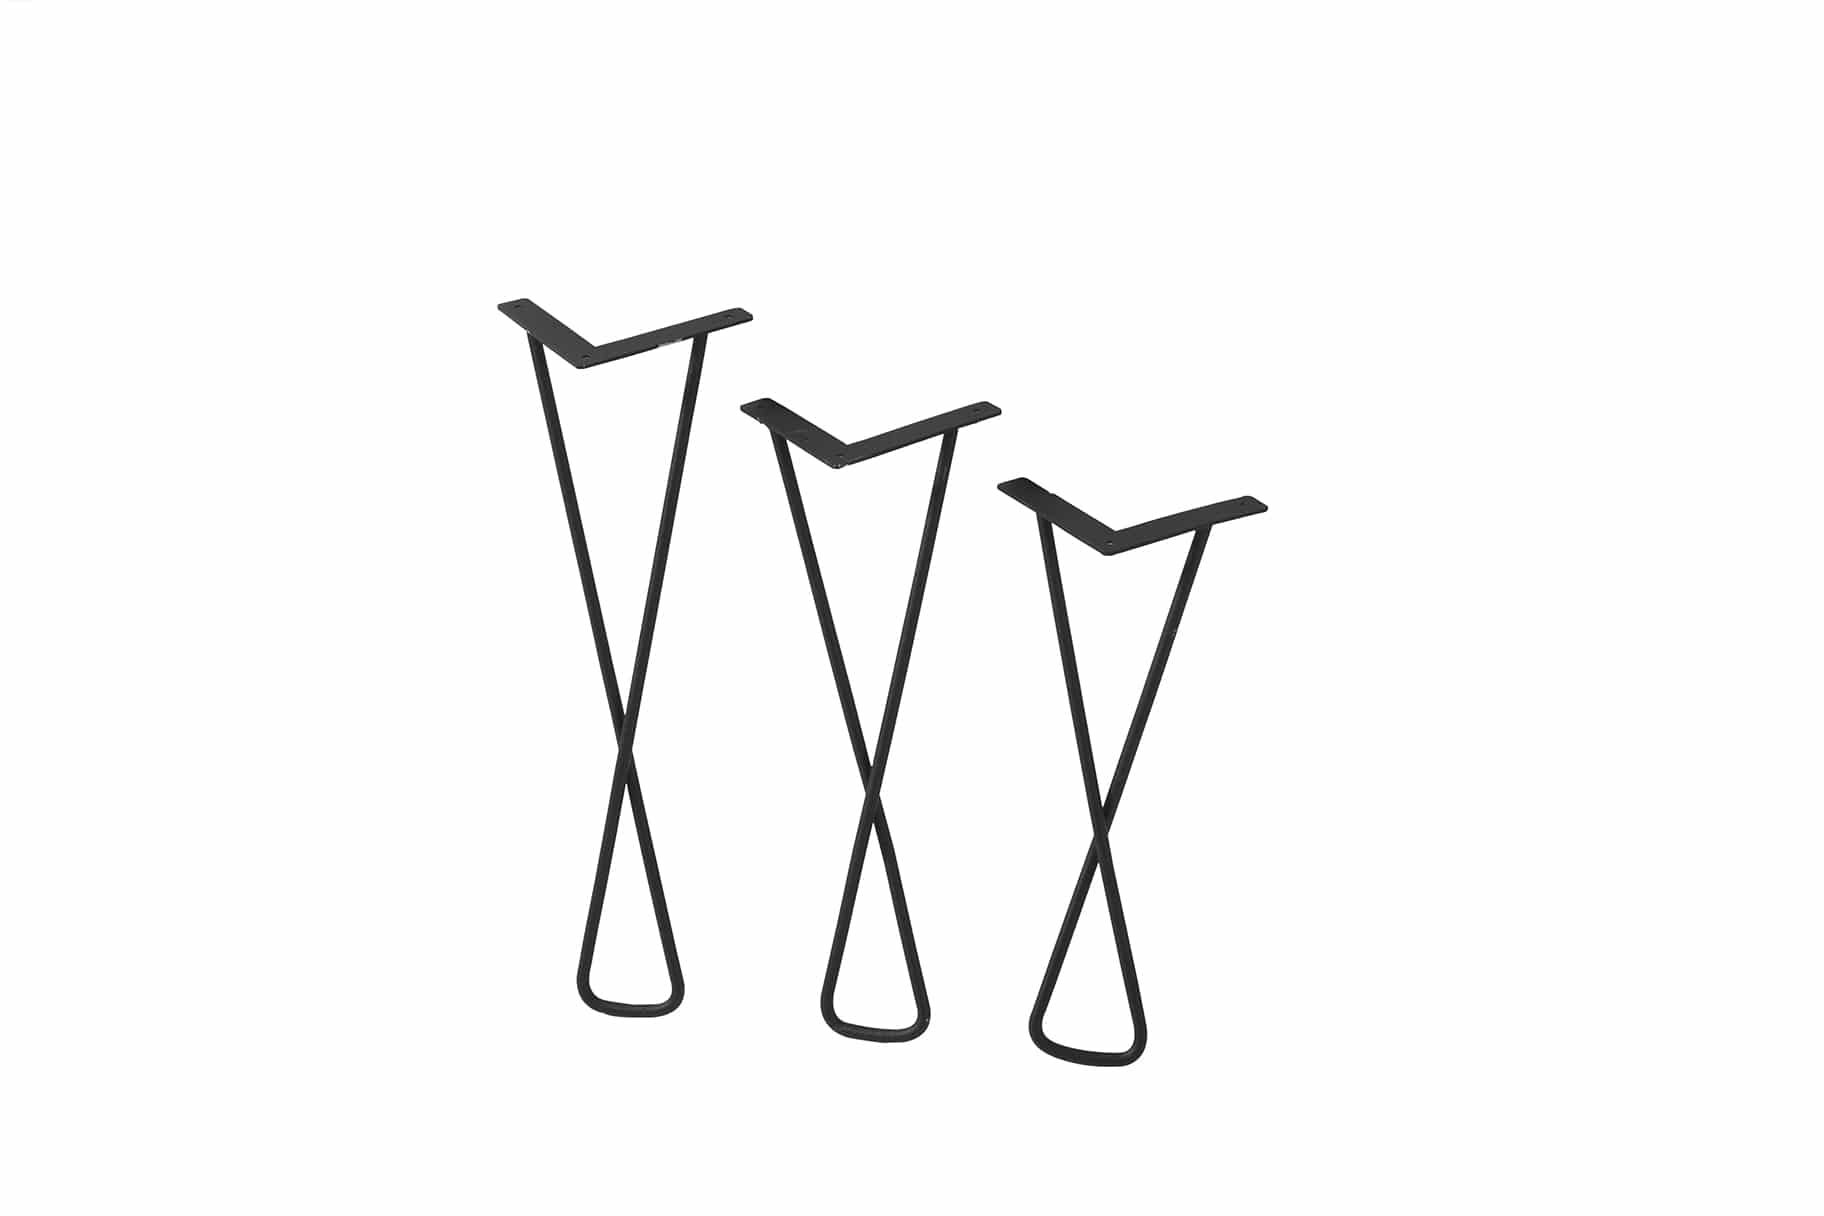 Hairpin Cross